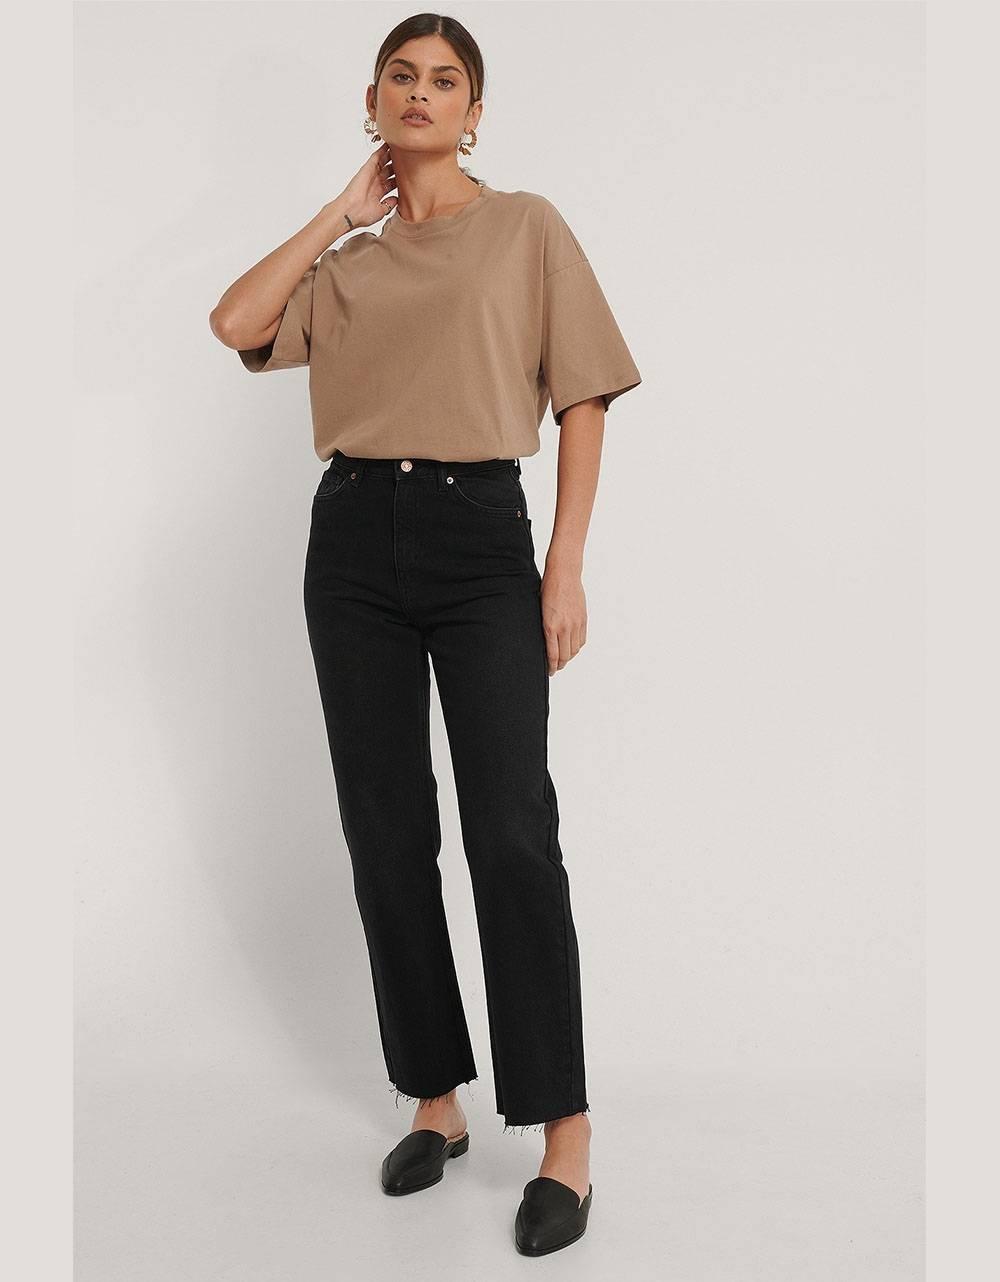 NA-KD organic straight high waist raw hem jeans - washed black NA-KD Jeans 56,56€